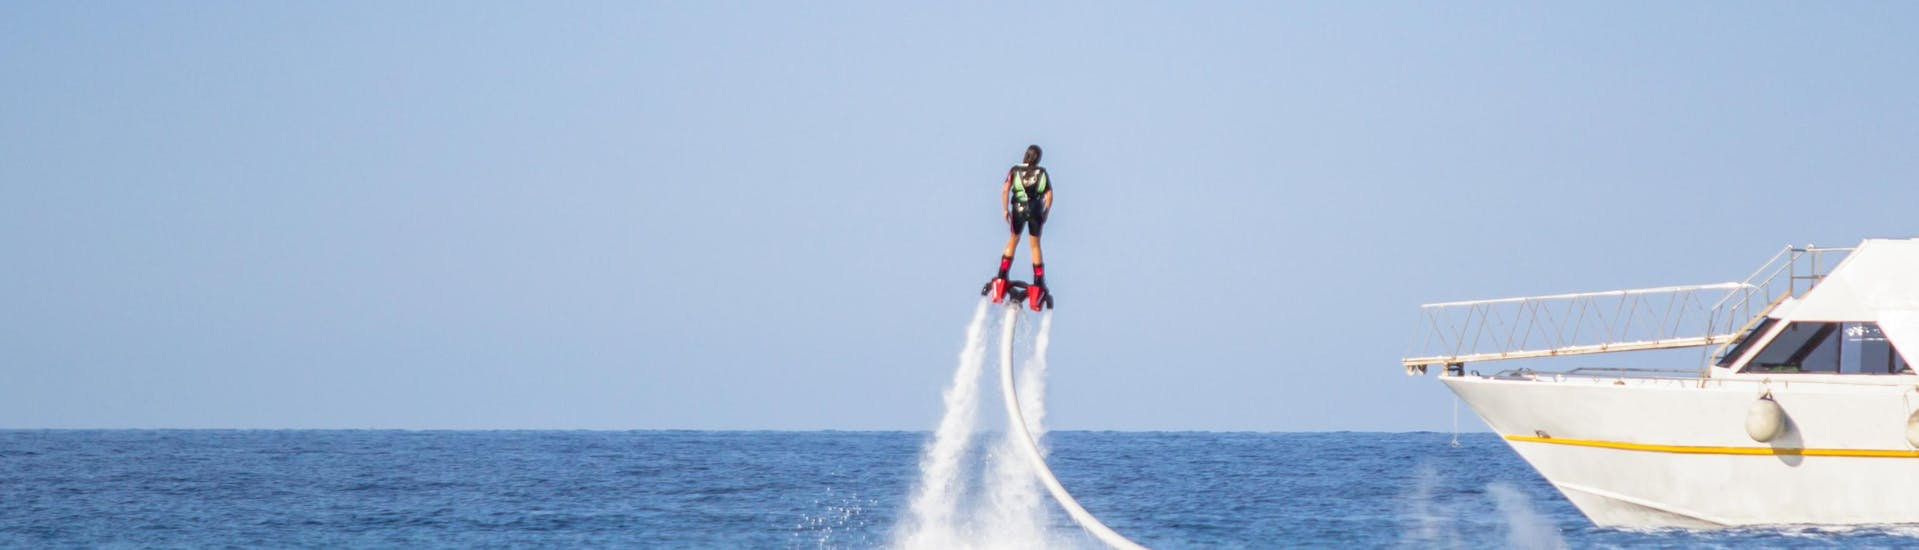 Man flyboarding on the ocean